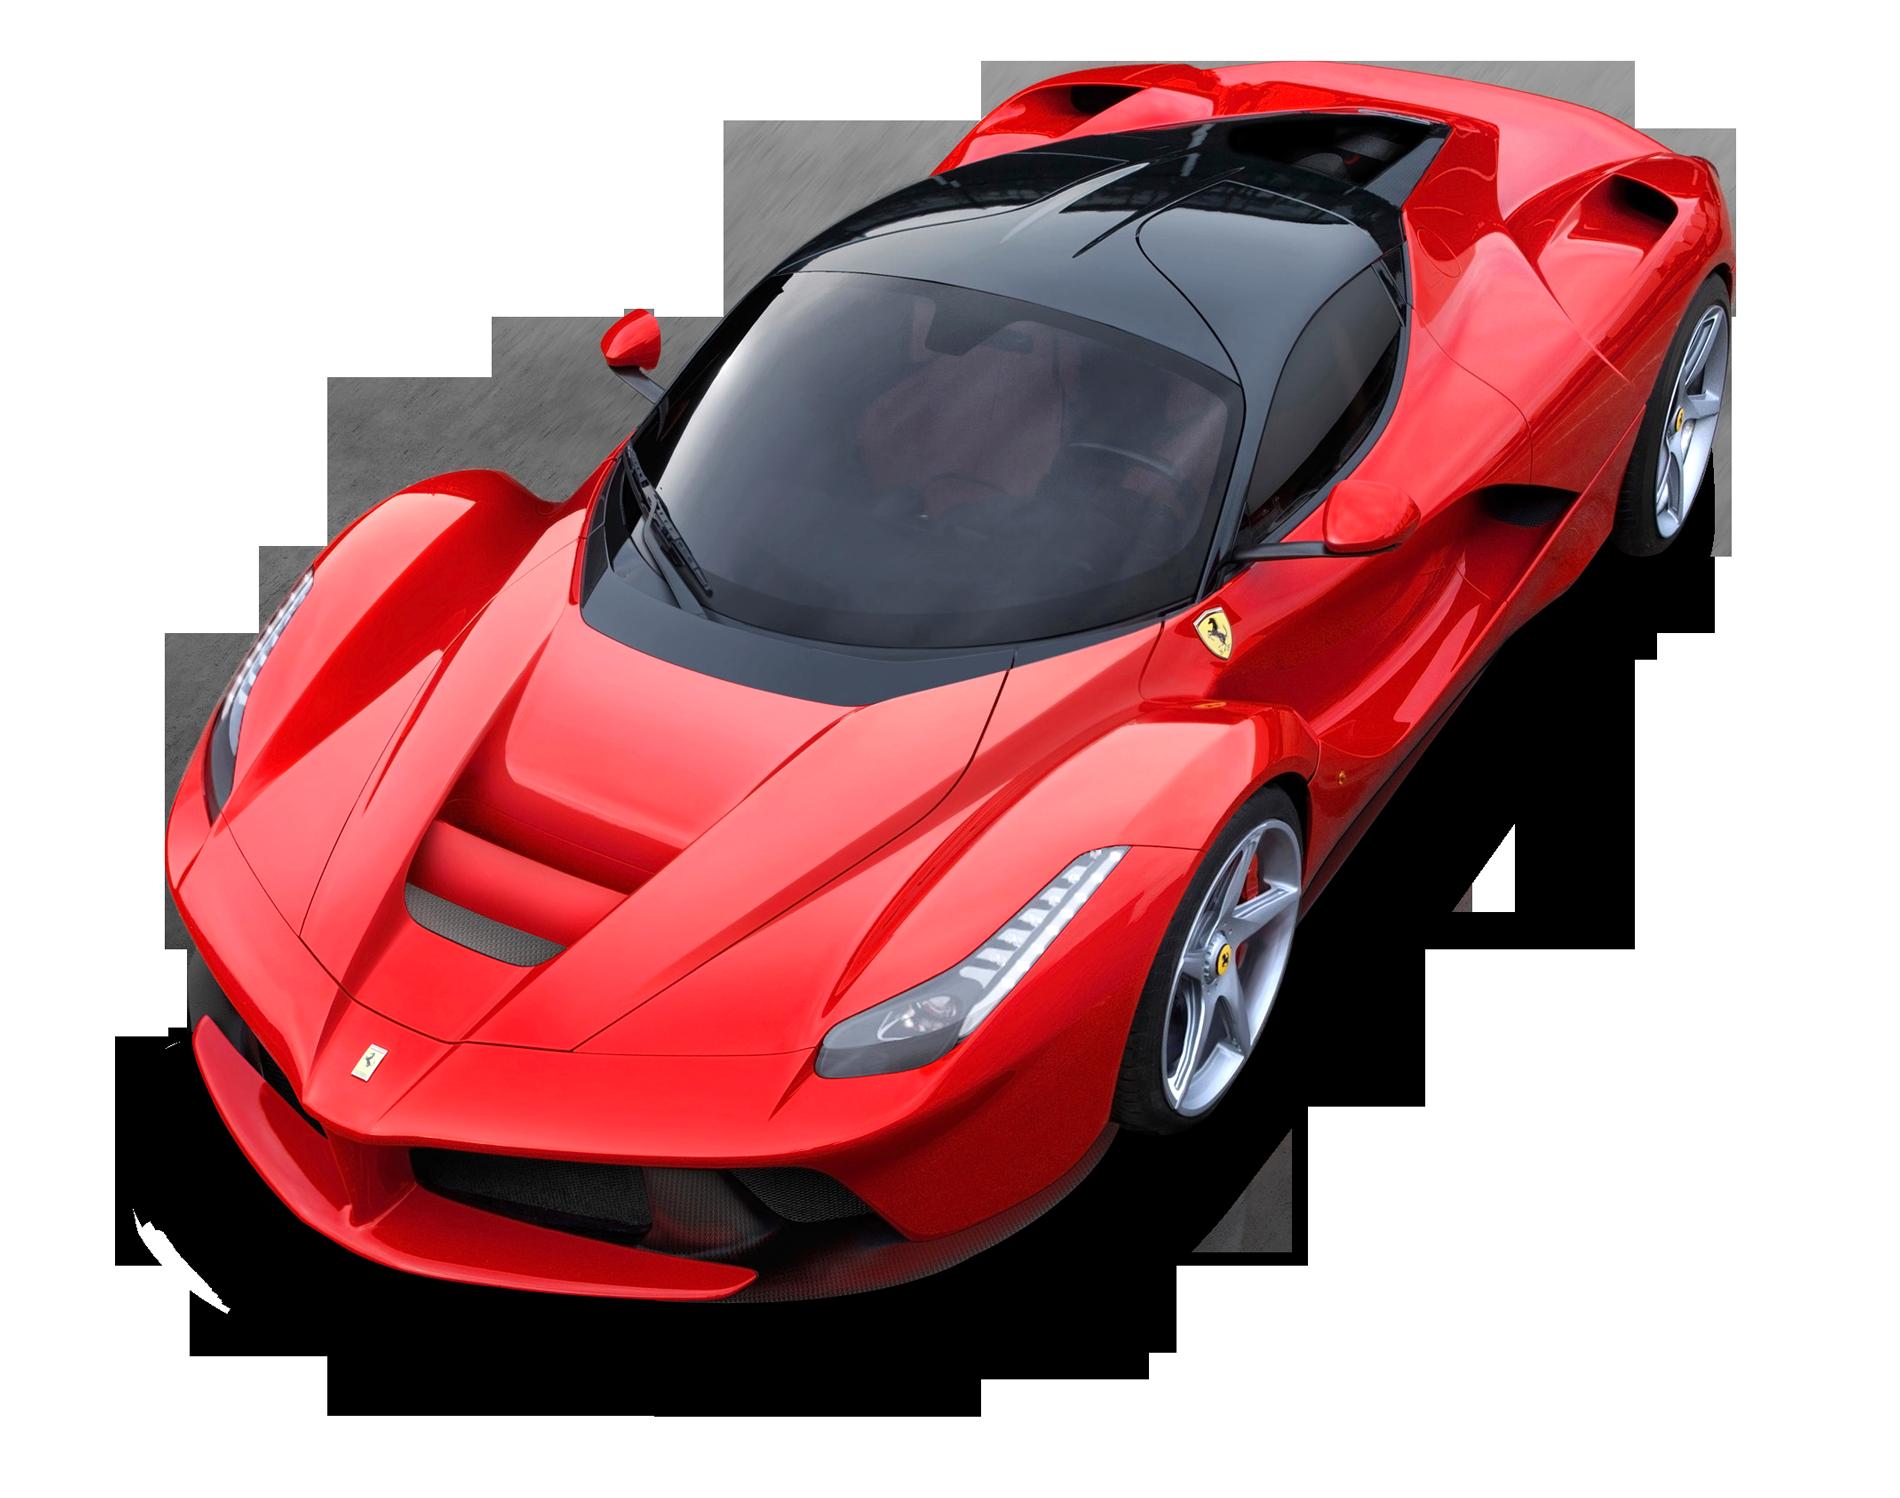 Top View of Ferrari LaFerrari Car